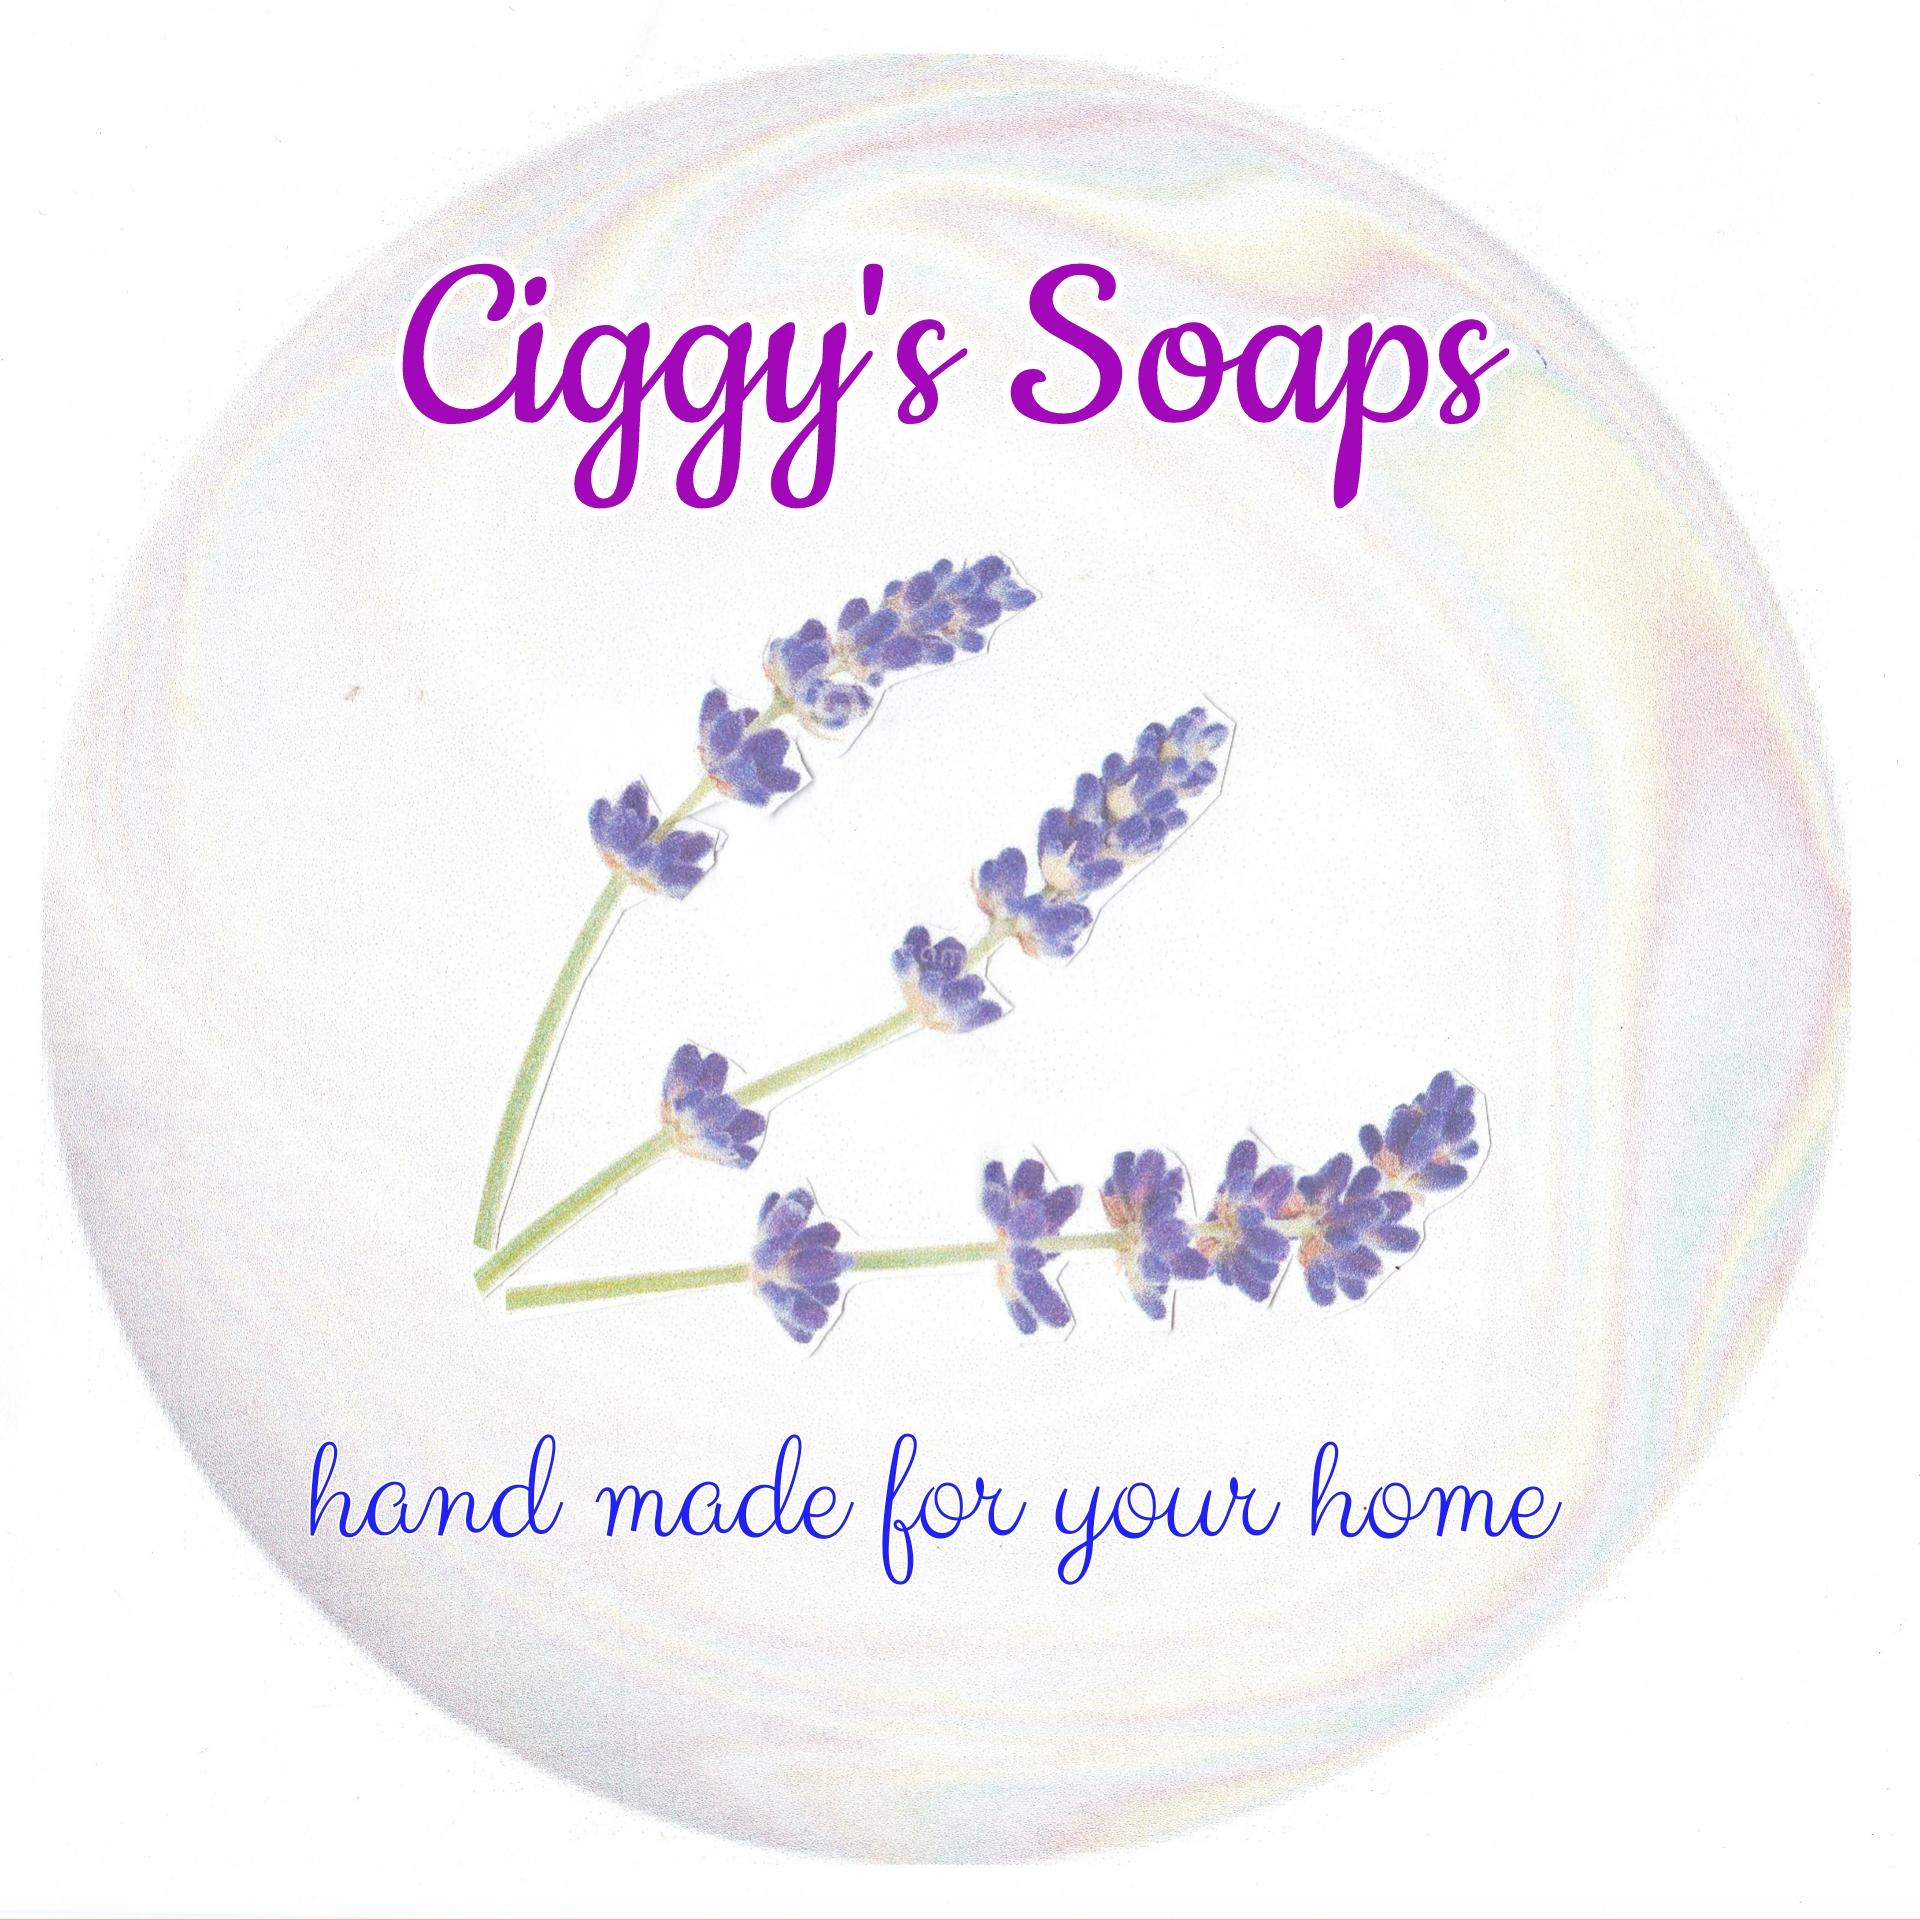 Ciggy's Soaps